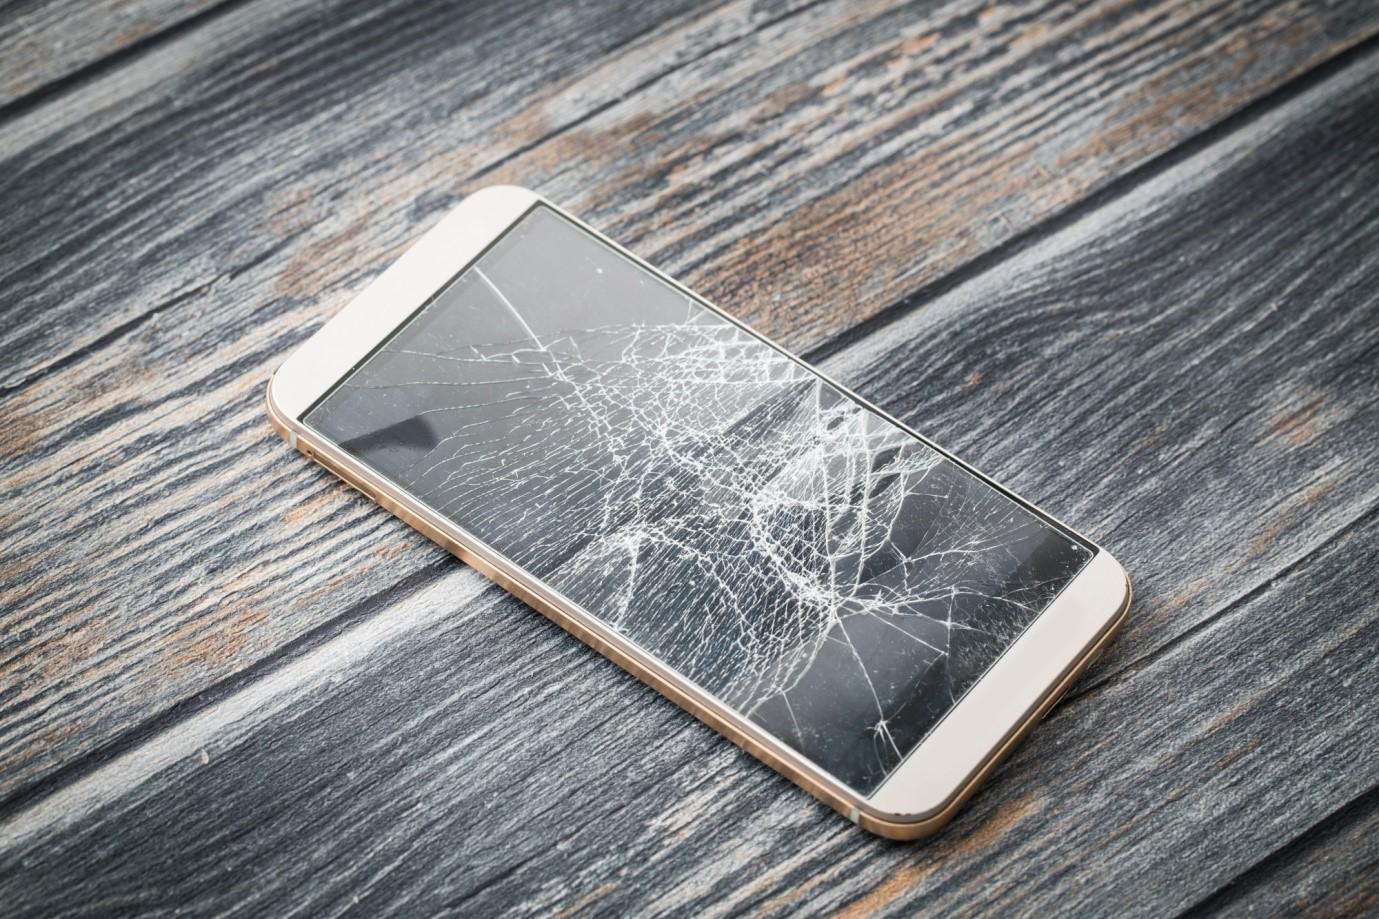 The Average Cost of iPhone Screen Repair